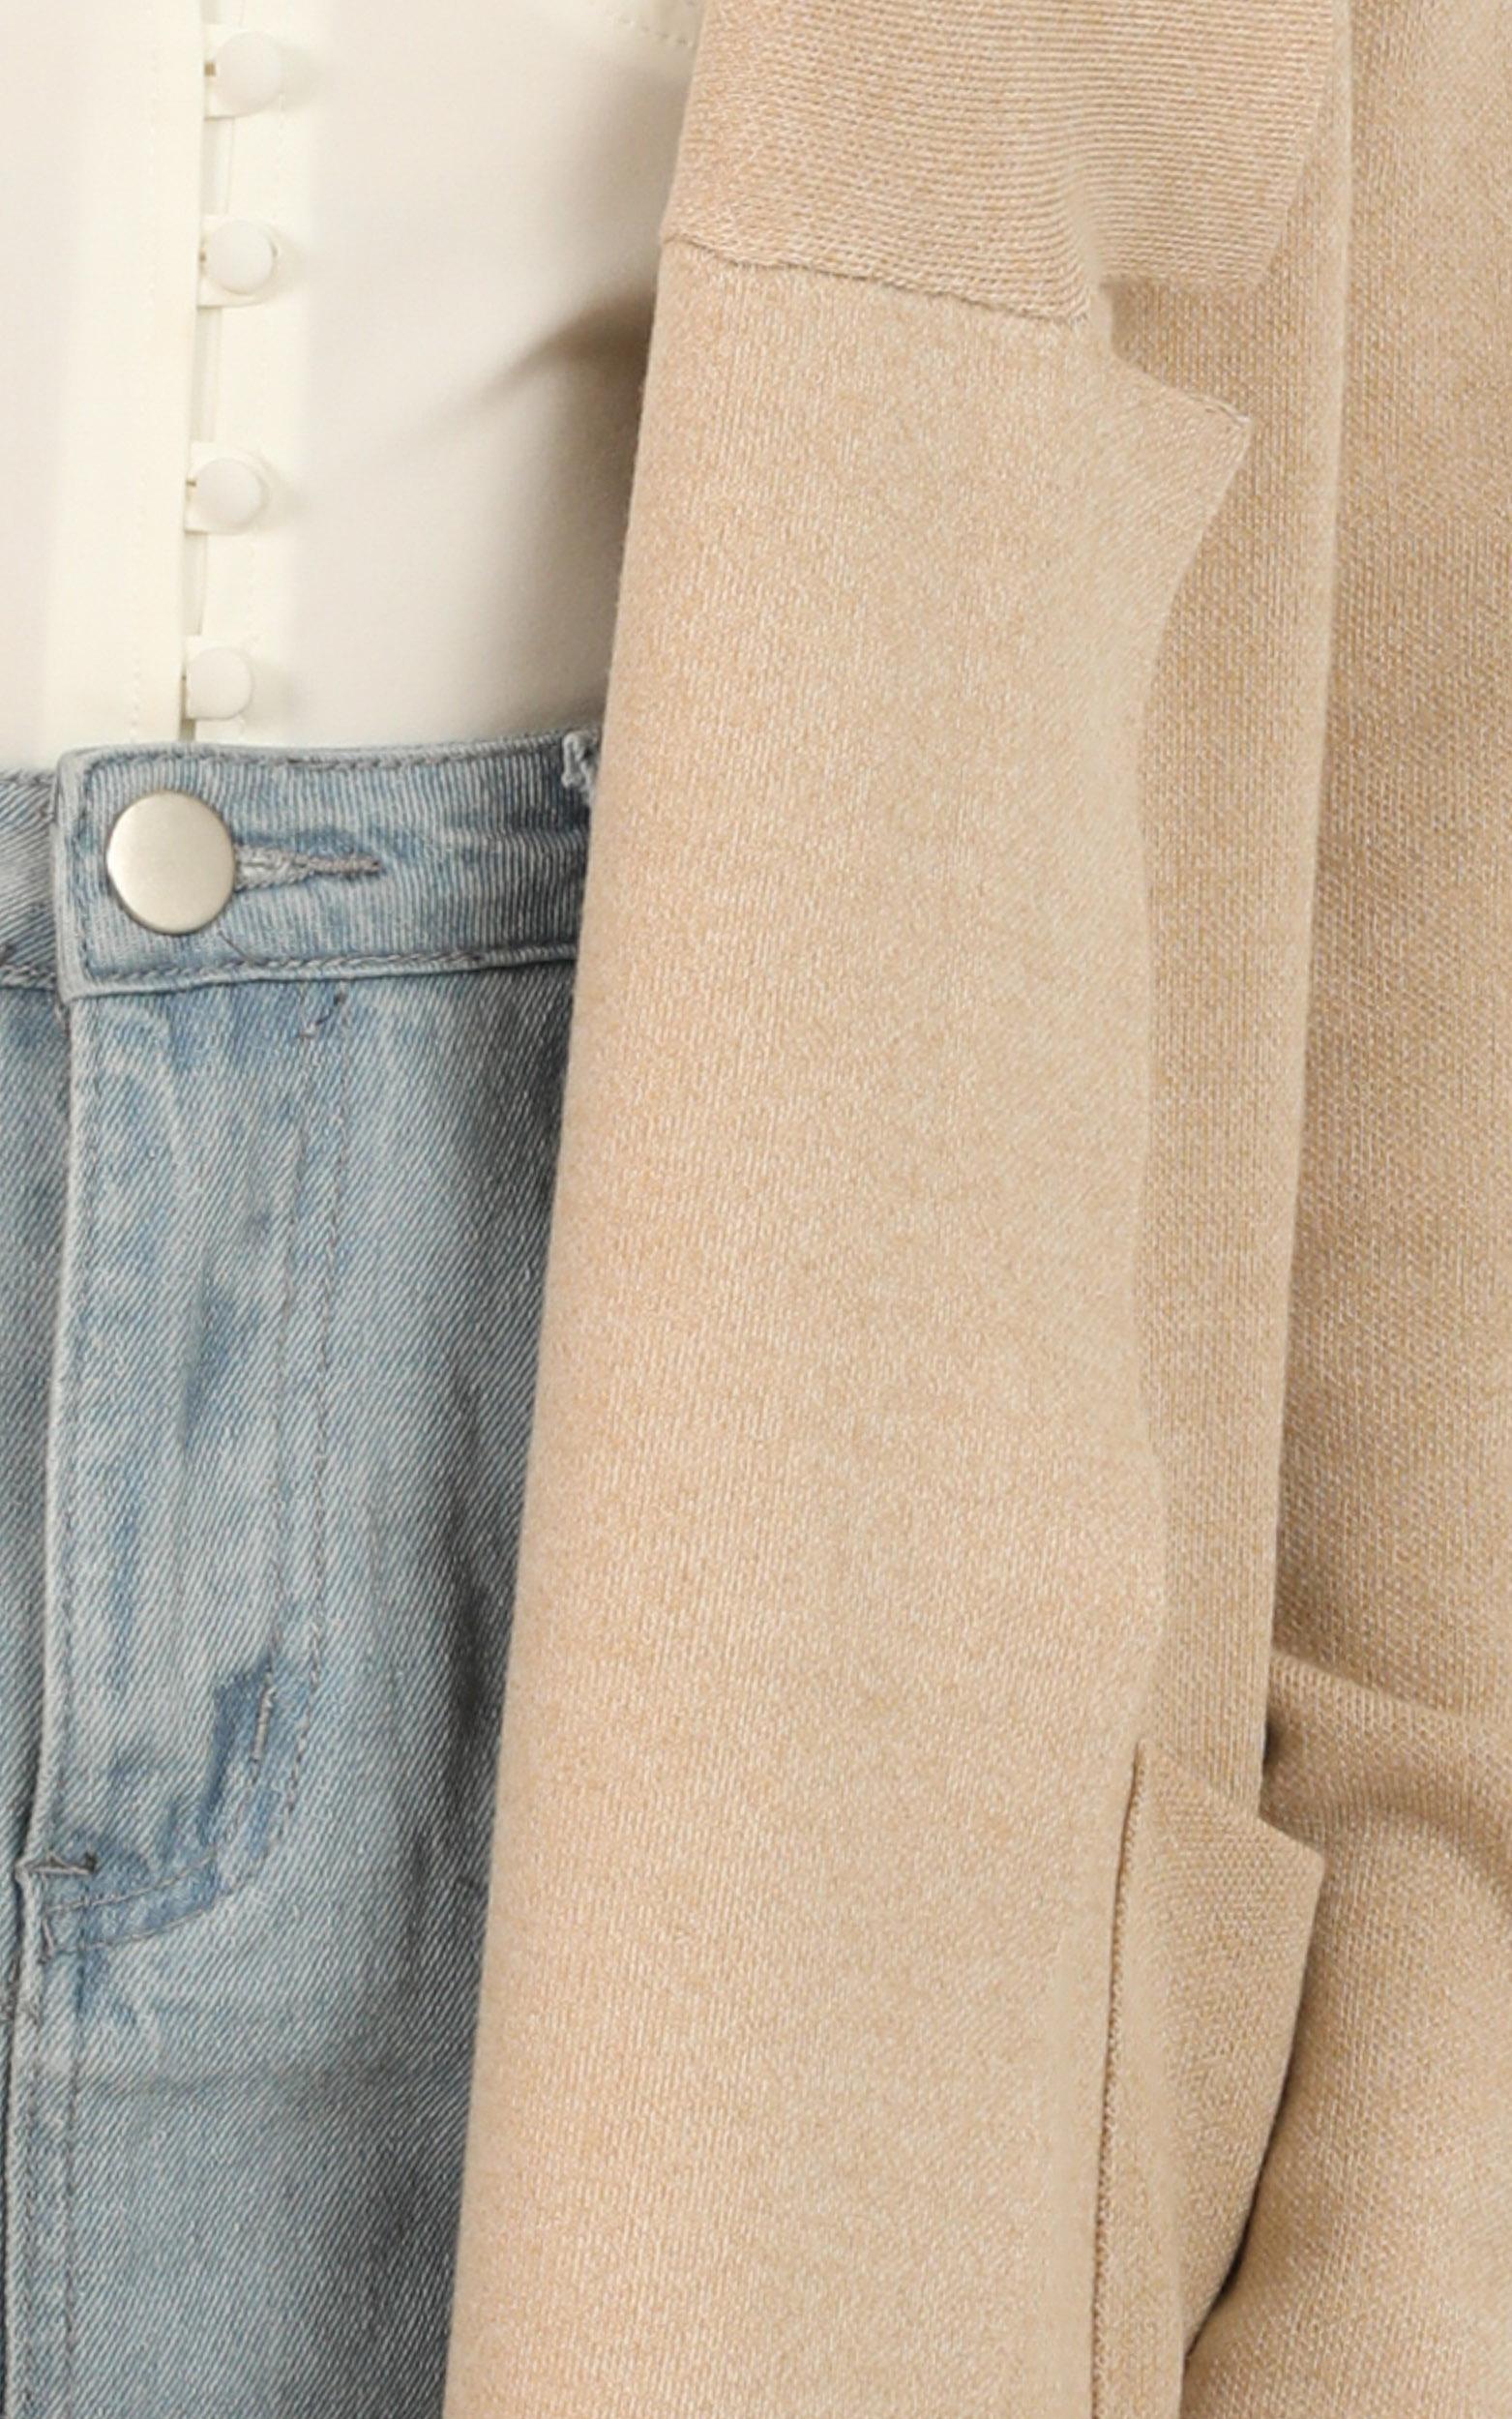 Around The World coat in beige  - M/L, Beige, hi-res image number null